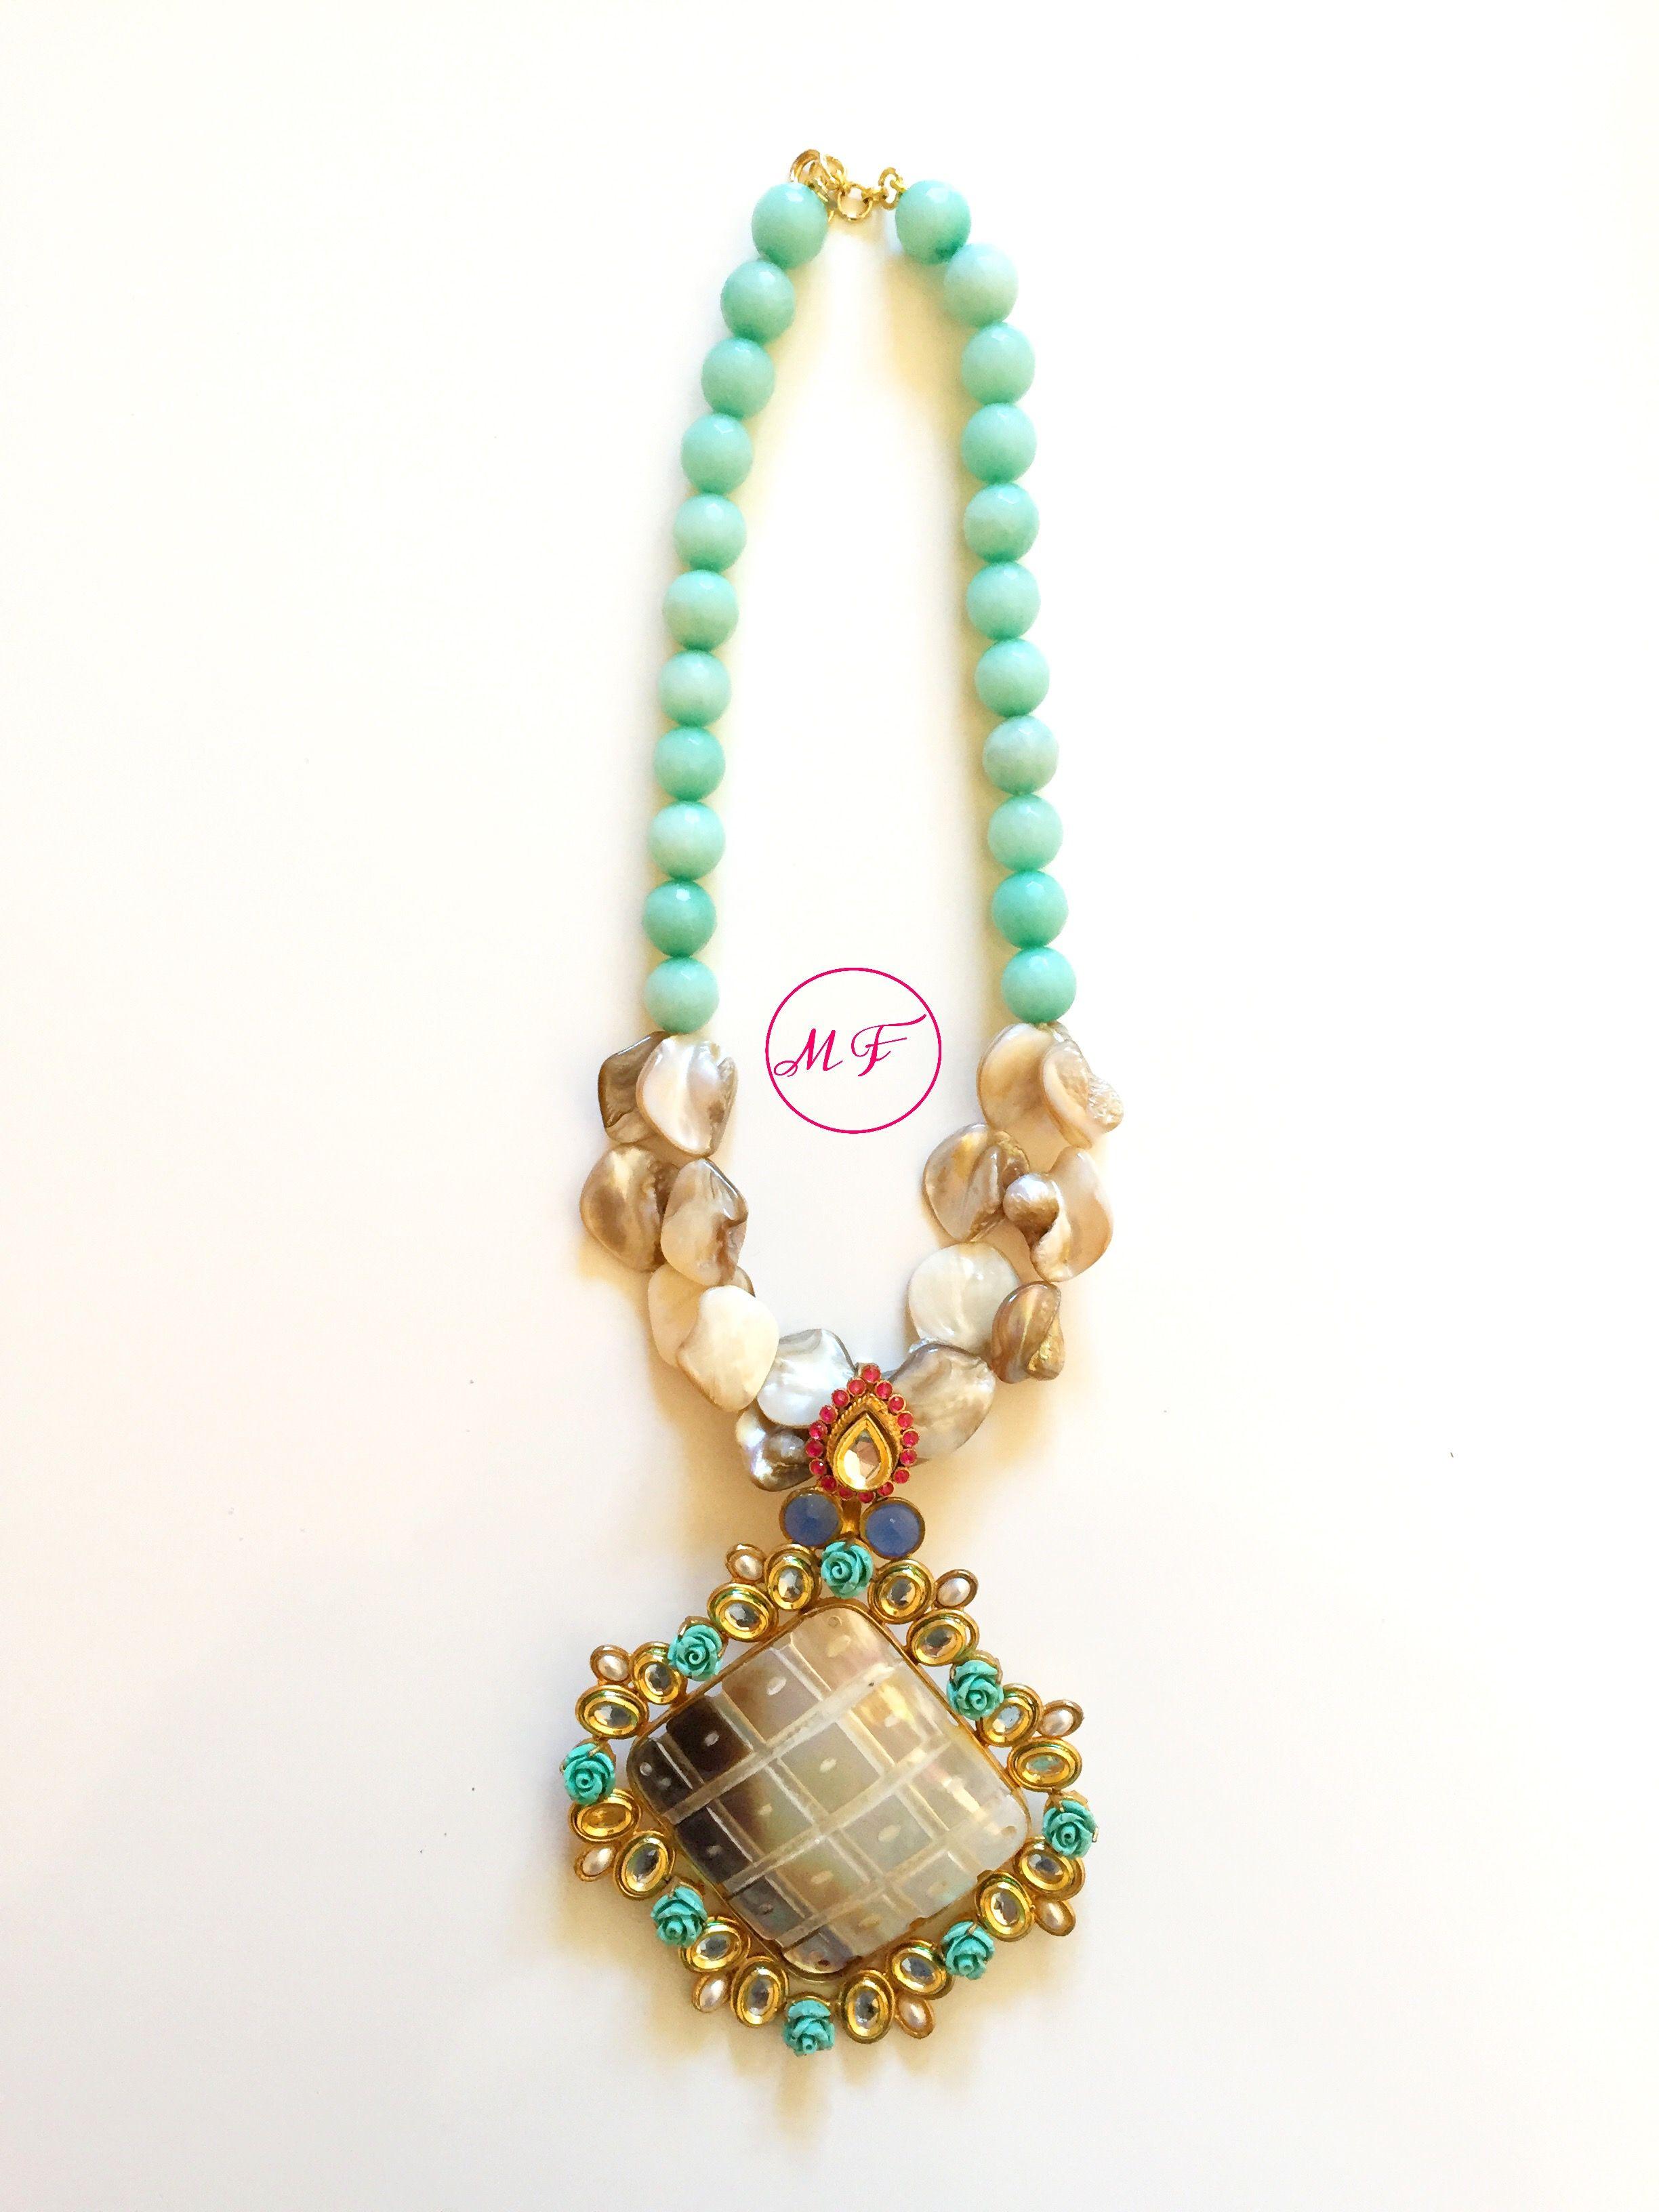 💚Ms Friesch💚 🛍www.msfriesch.com🛍 🍁www.msfriesch.wordpress.com🍁 #msfriesch #jewelery #cool #fashion #shopping #women #outfit #new #mujeres #moda #style #street #inspiration #christmaspresents #christmas #design #handcraftedjewelry #jewellery #gemstones #gift #regalos #estilo #fashionista #womenswear #schmuck #uniquejewelry # Jewelrydesign #spiritualjewelry #trends2018 #stunning  #chic #luxury #glamour #accessories #contemporaryjewelry #bijoux #gioelli #bisutería #new